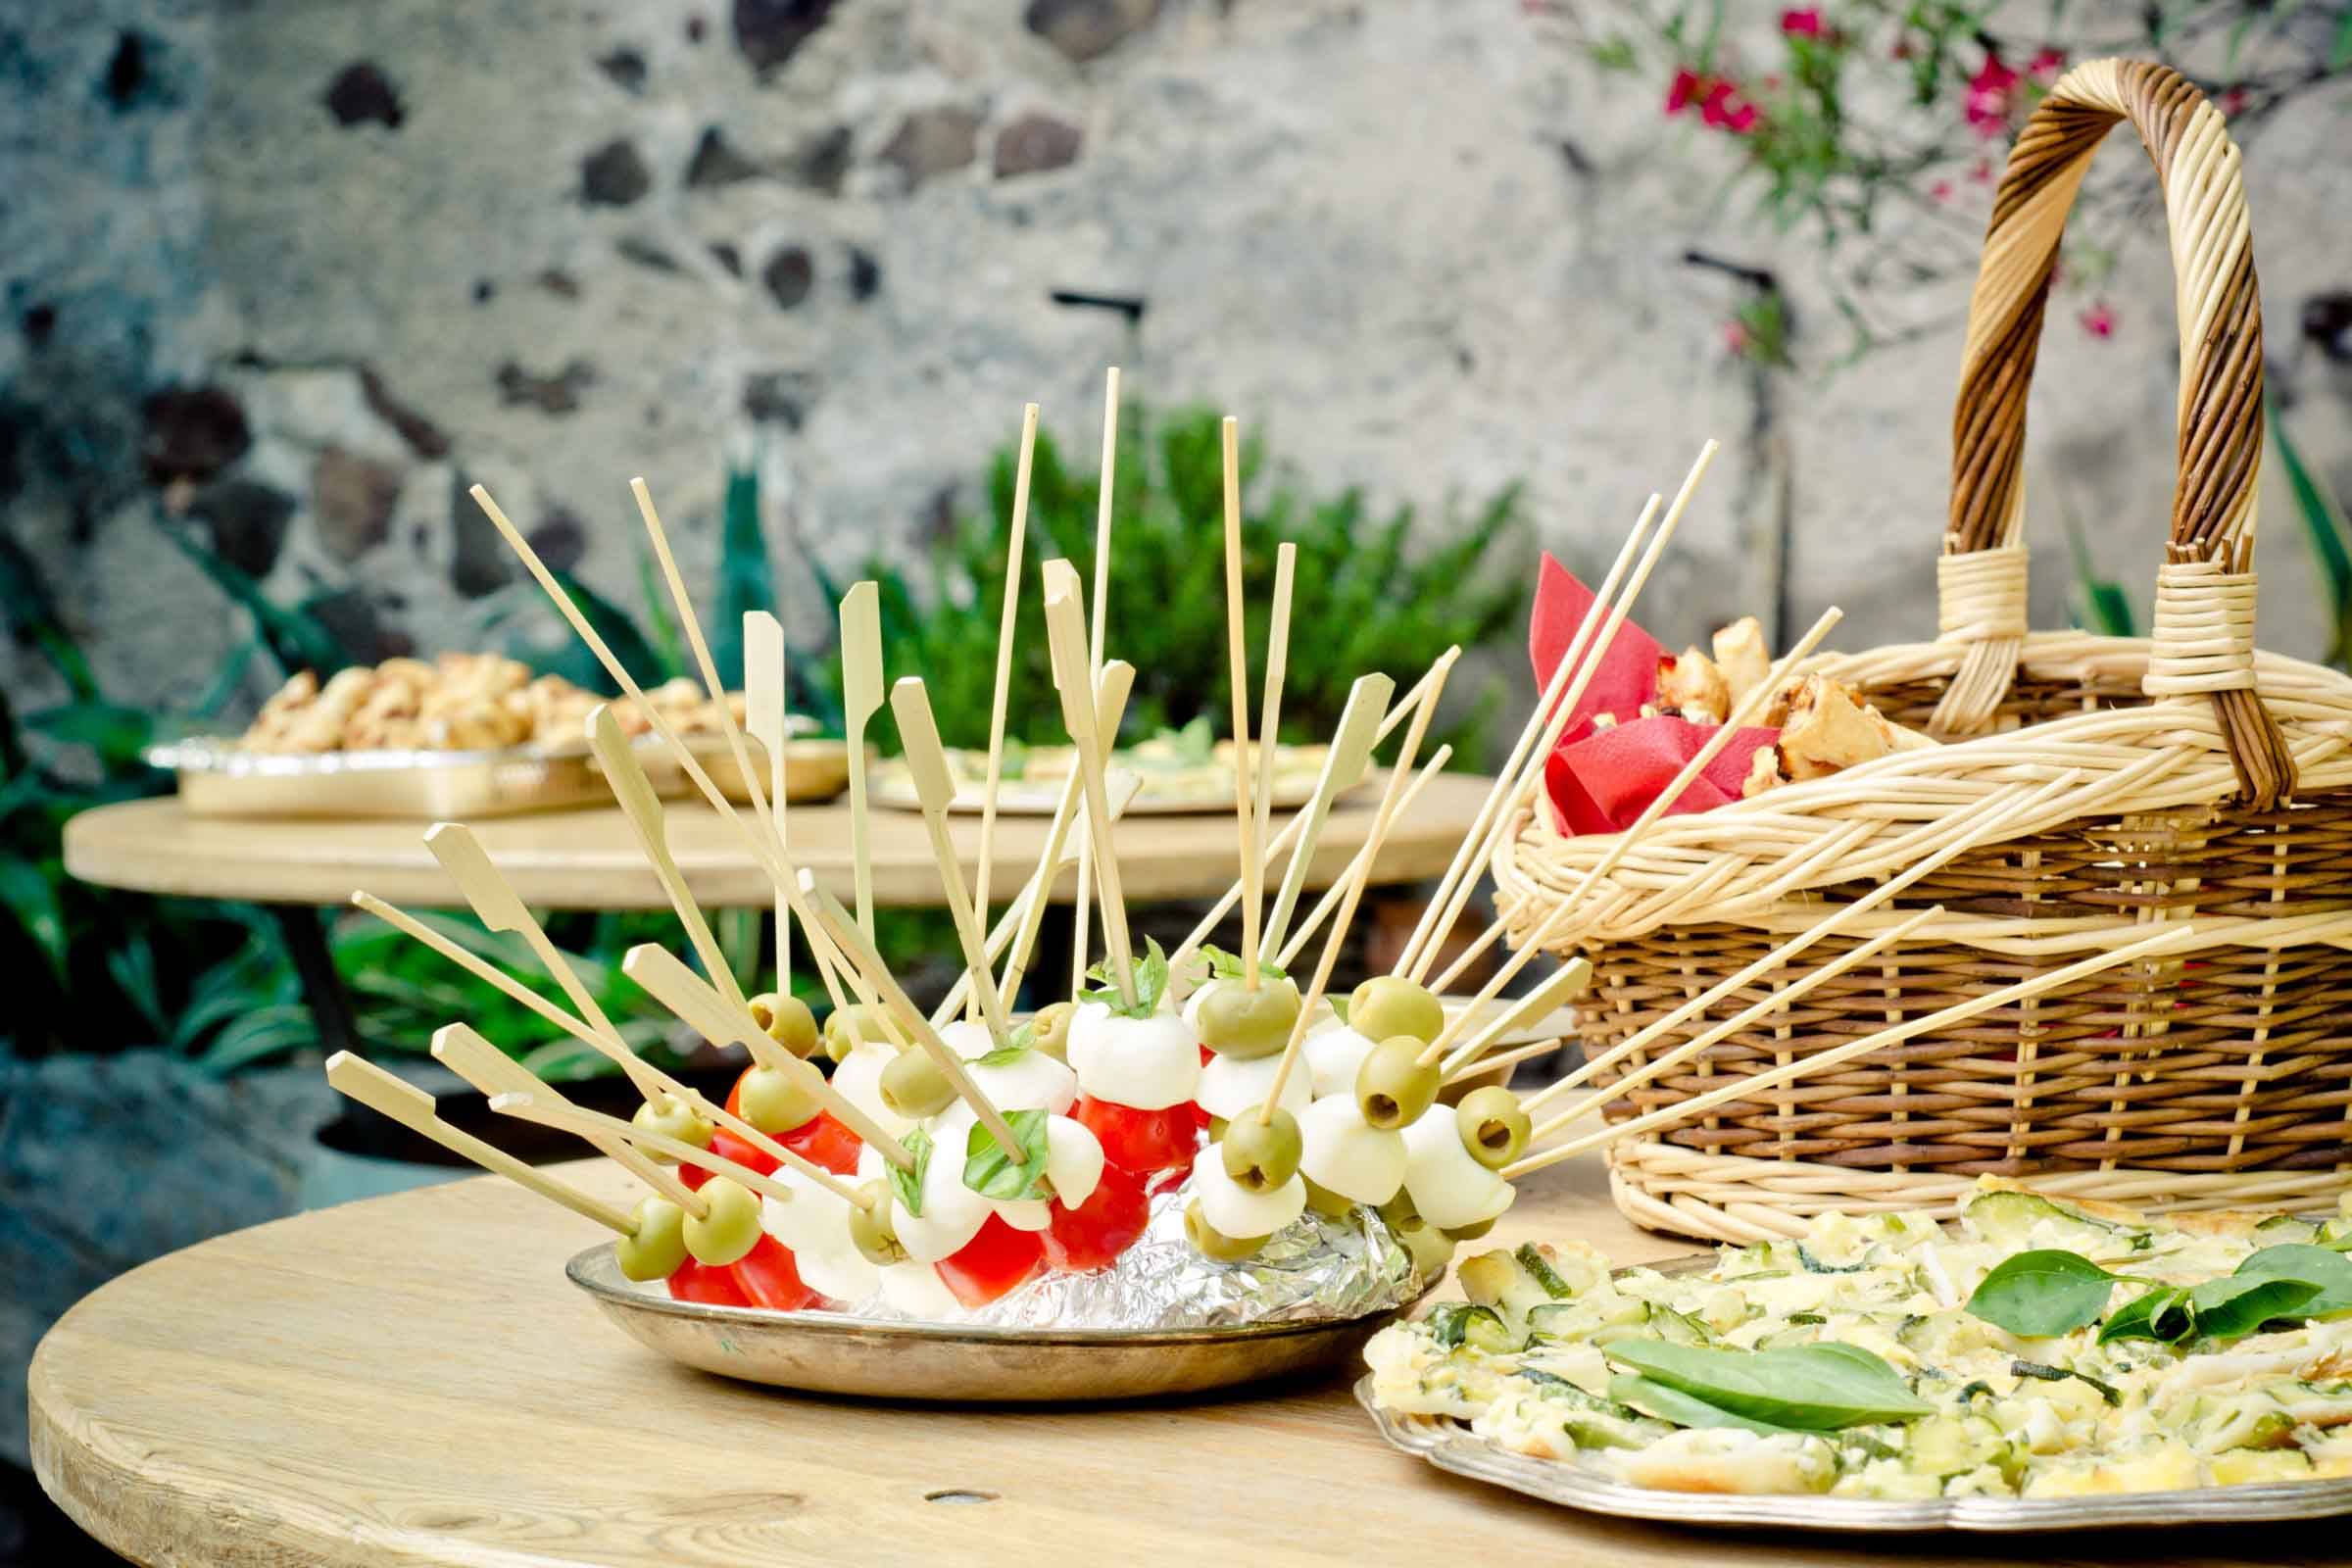 Brochetas de comida vegetariana